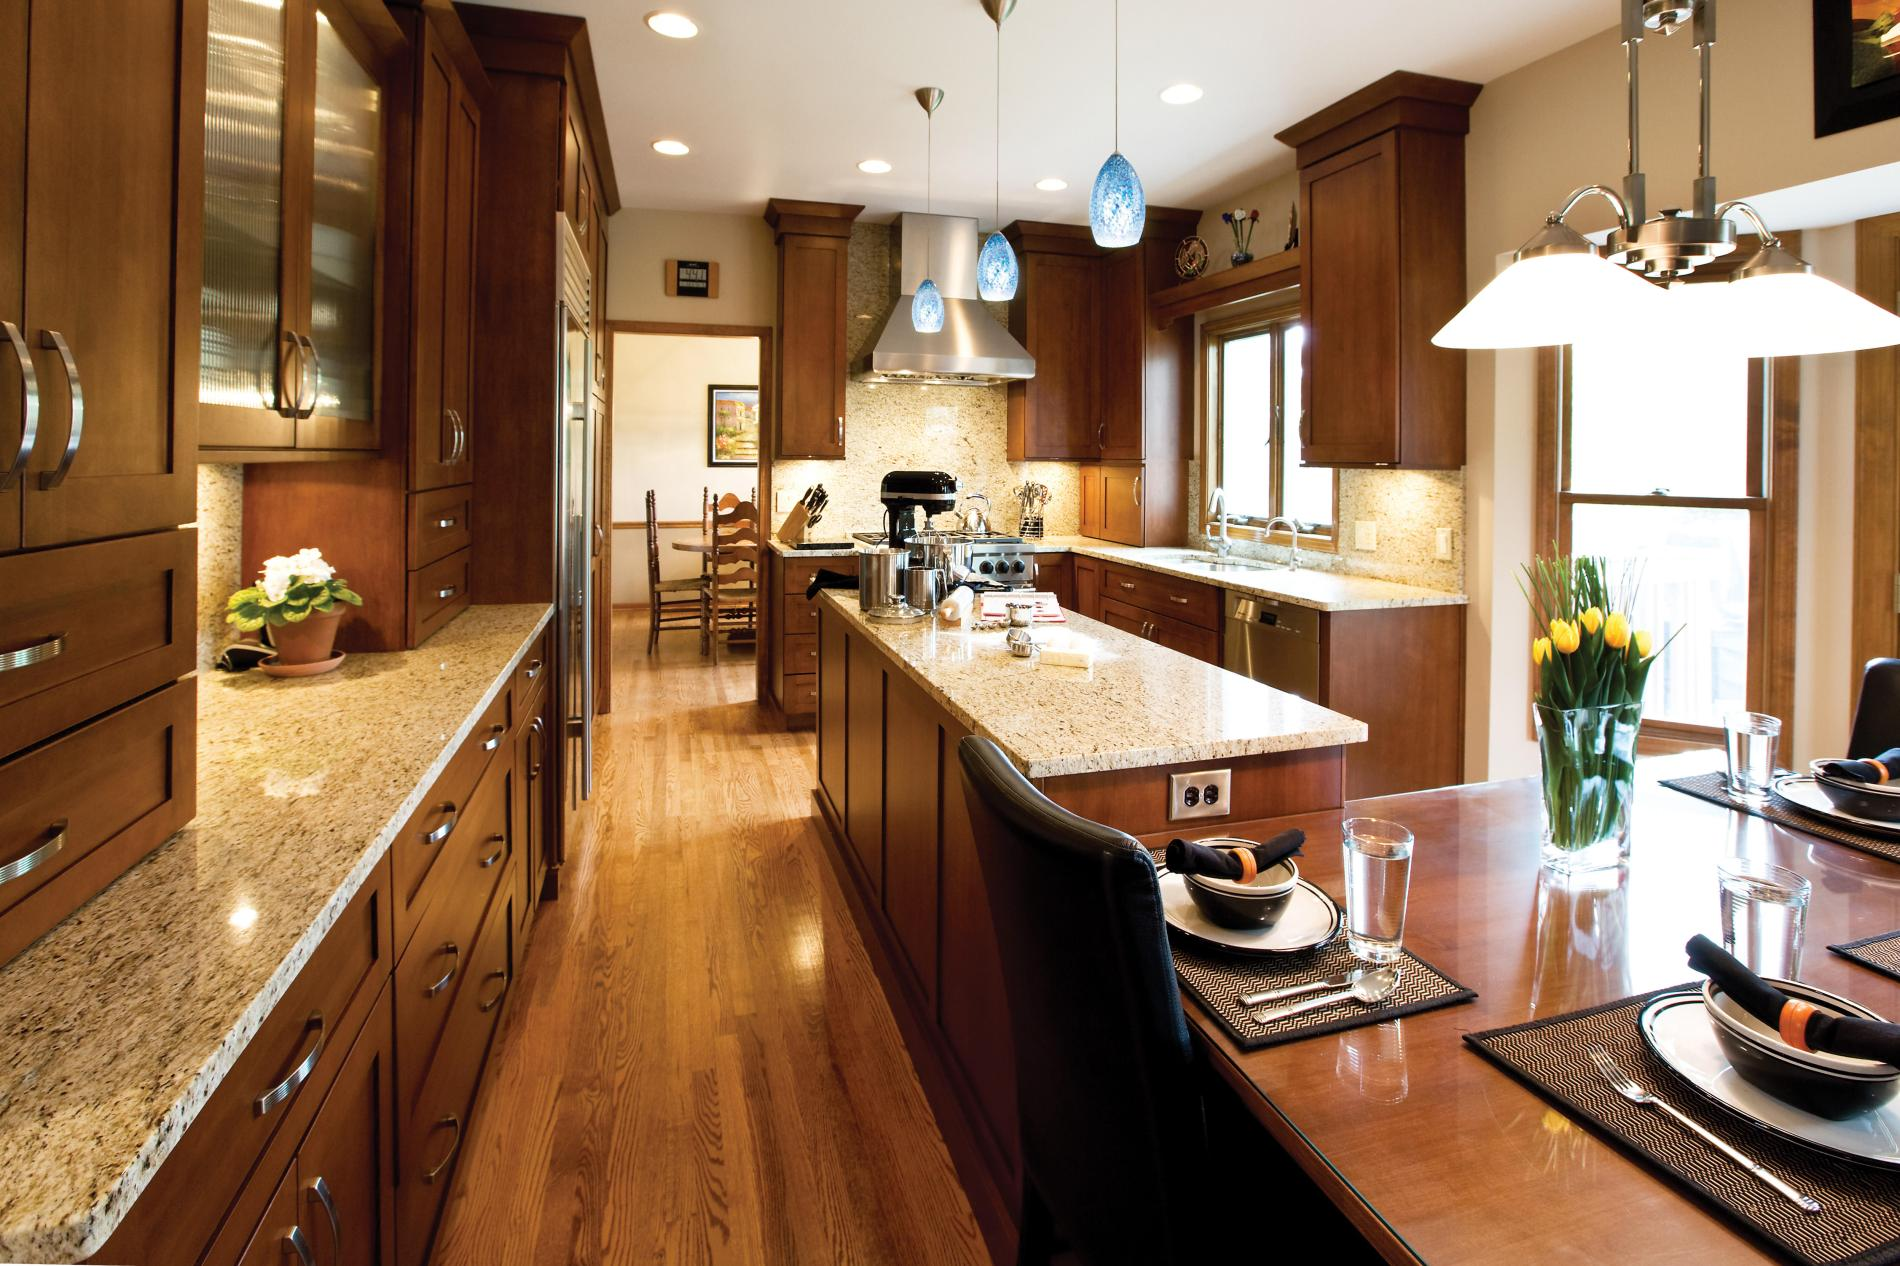 дизайн интерьера кухни.jpg